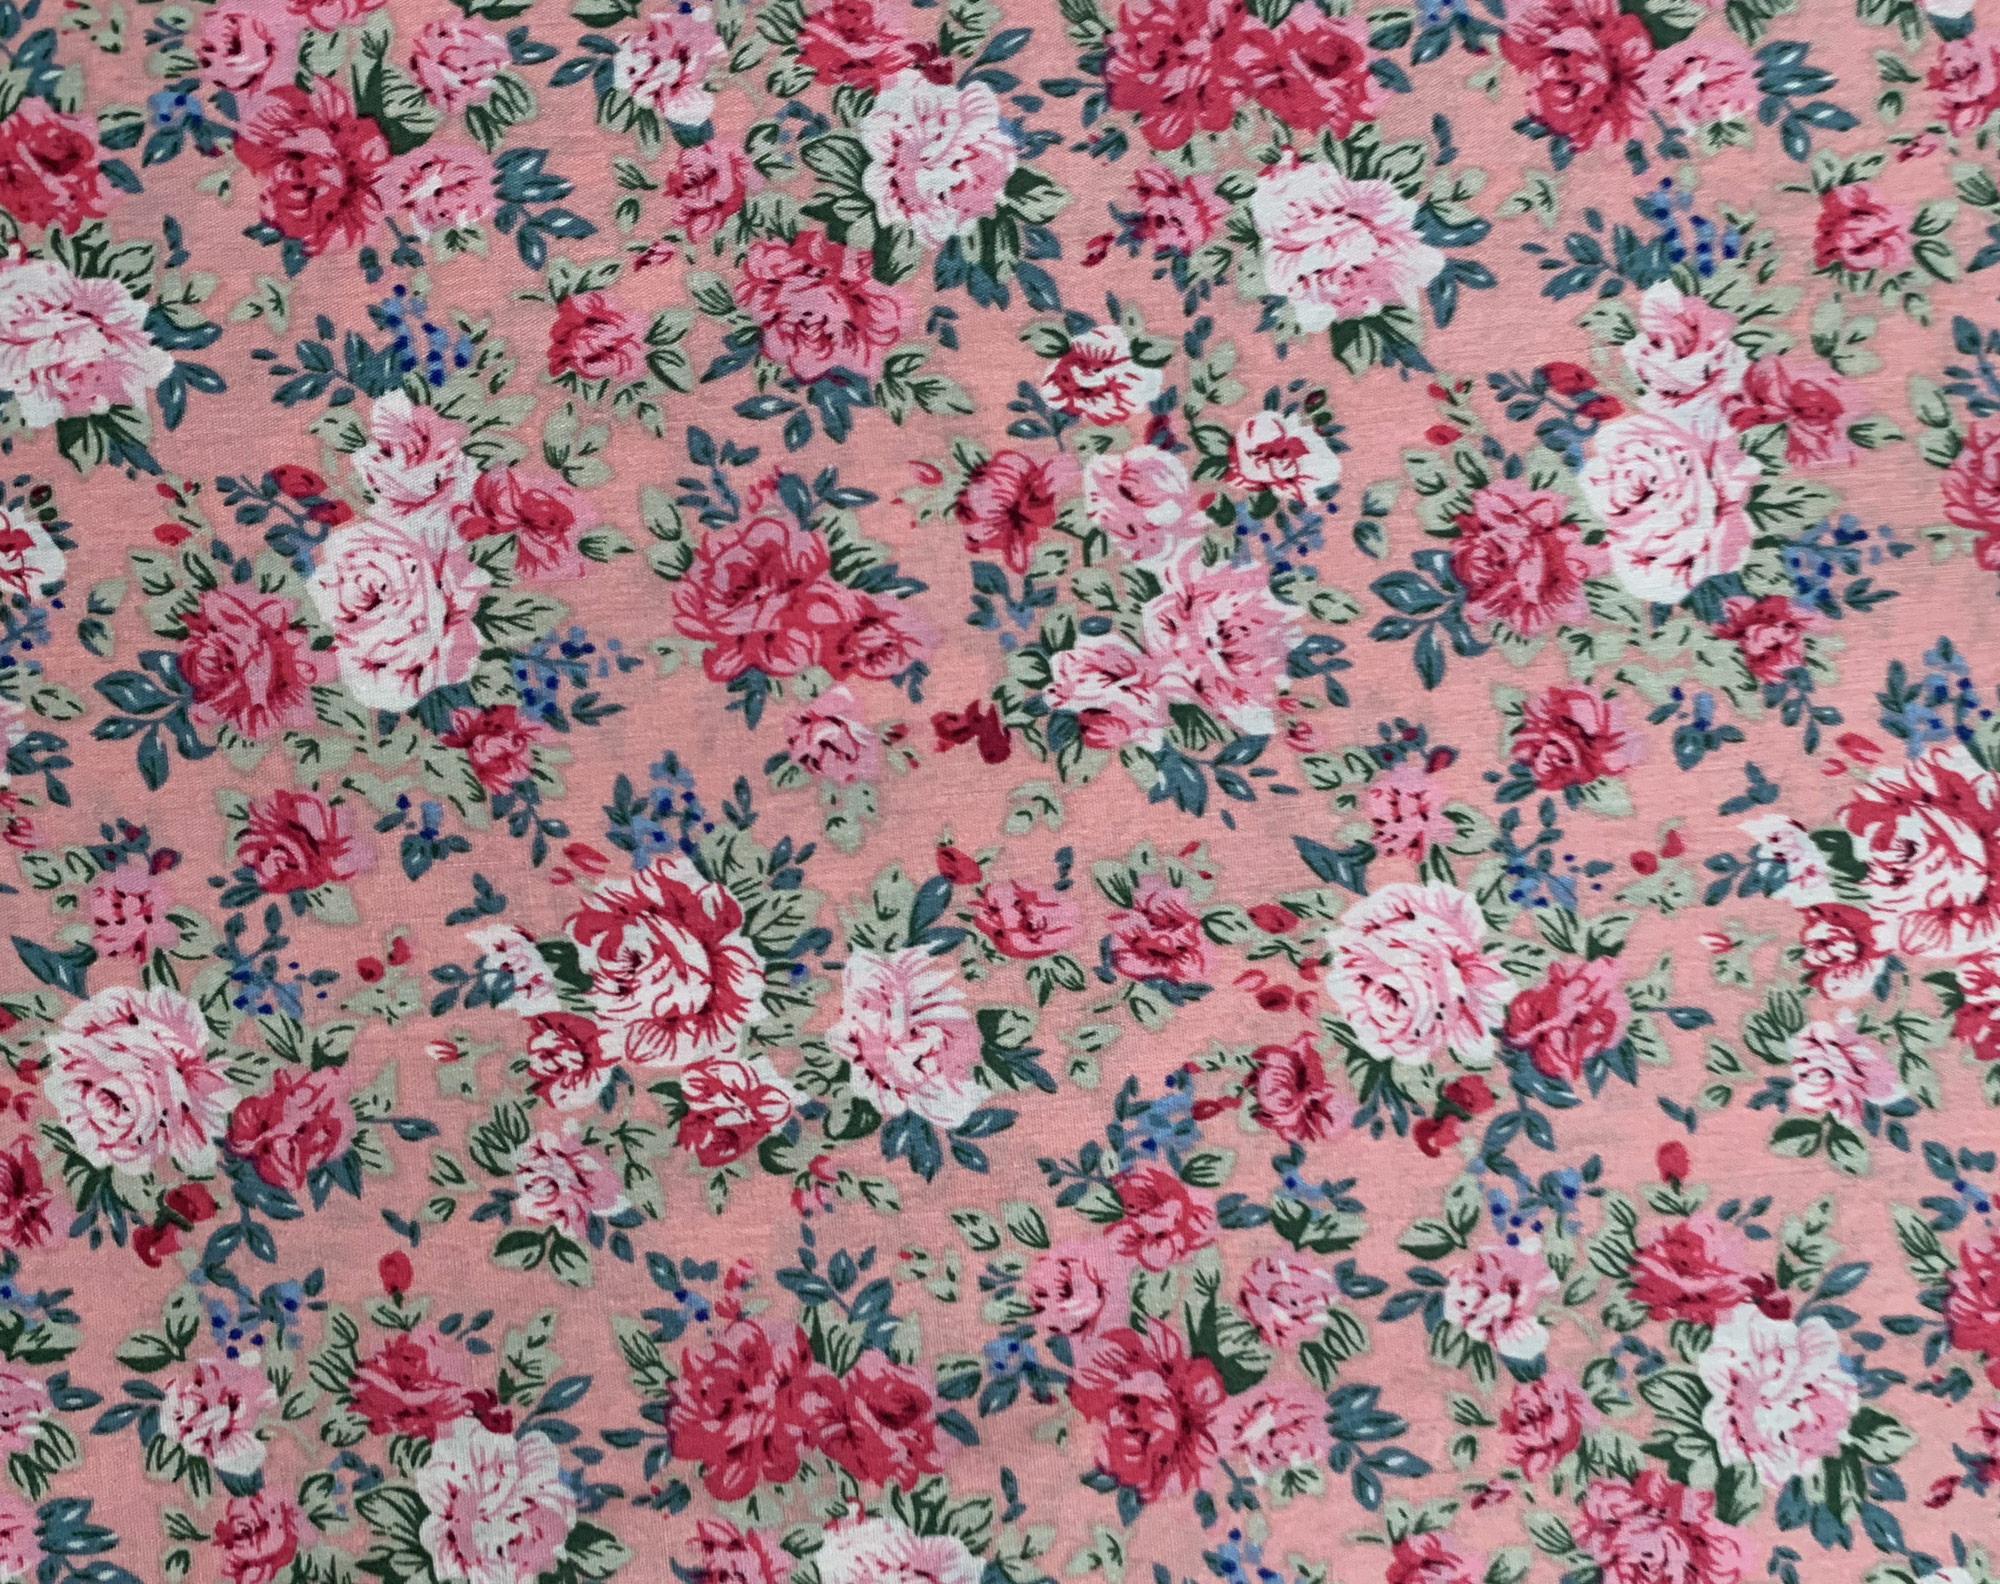 Floral in PINK – Vintage NEW PATTERN